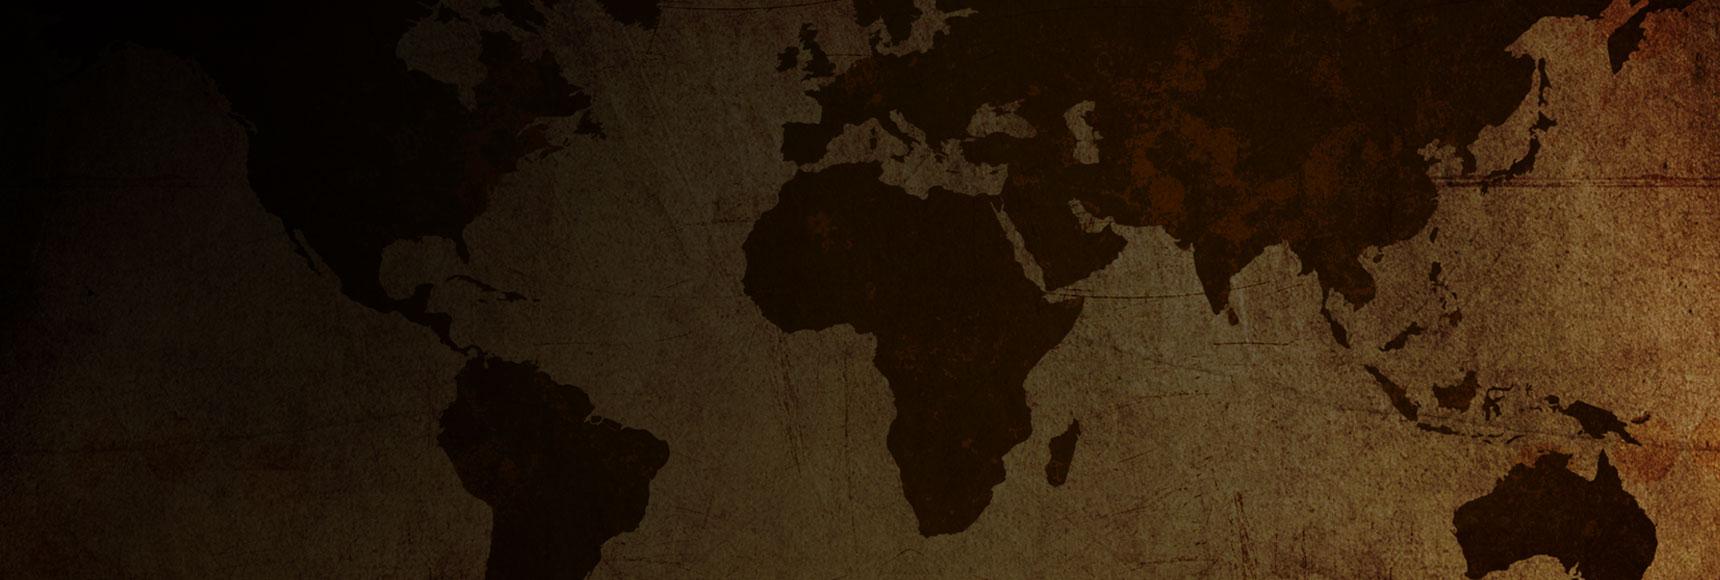 brown world map